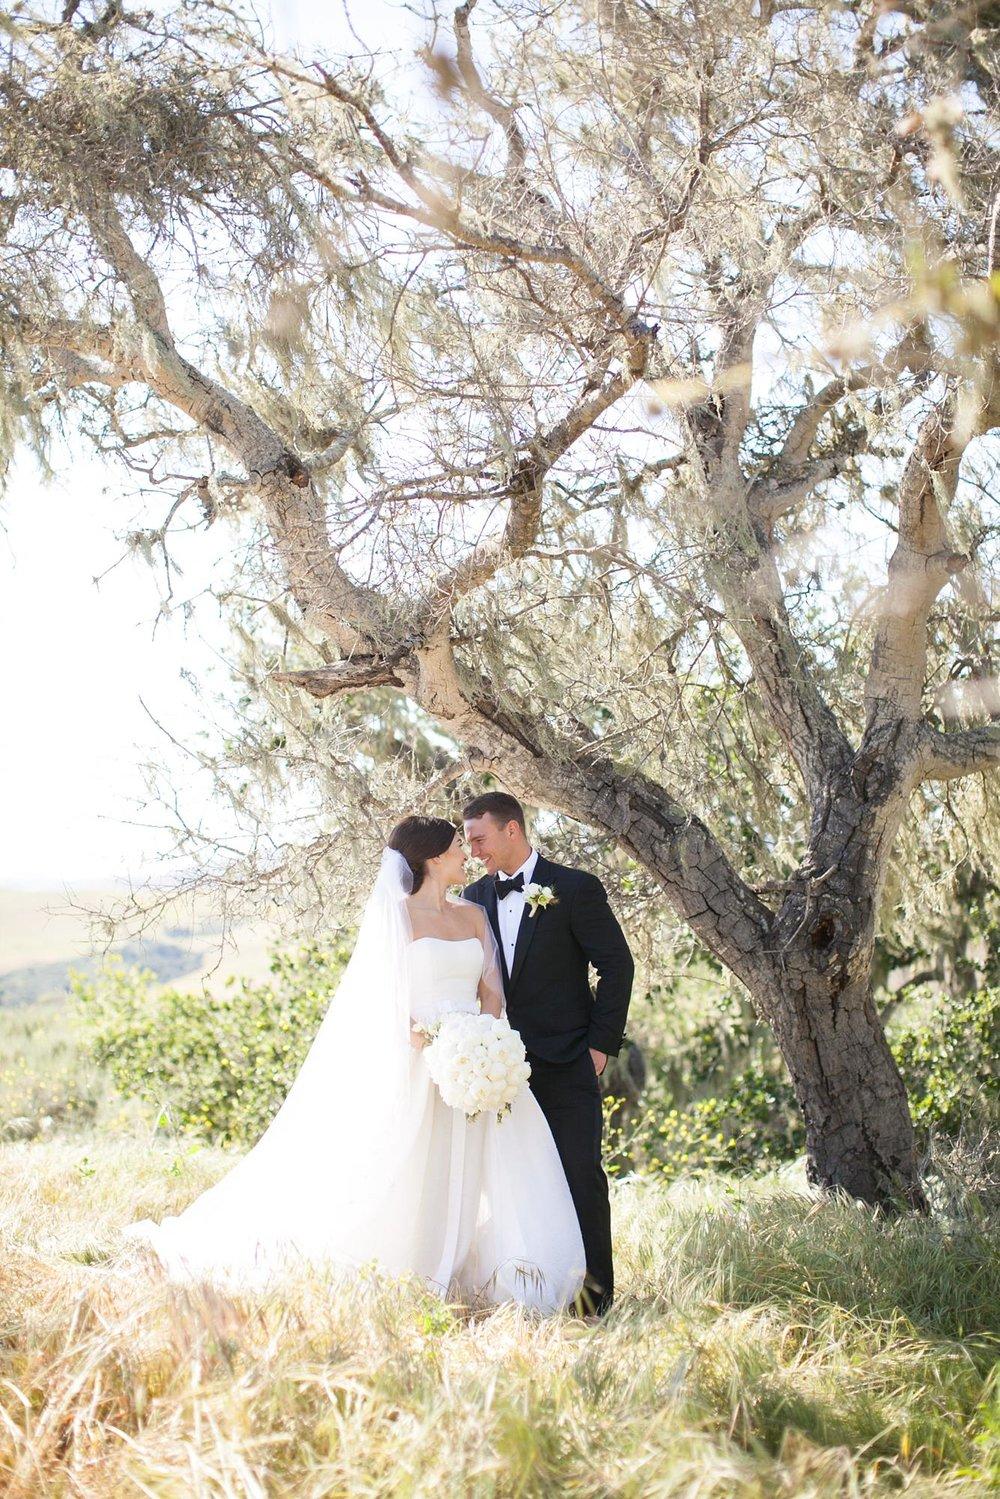 Santa Ynez Vineyard Wedding | Miki & Sonja Photography | mikiandsonja.com